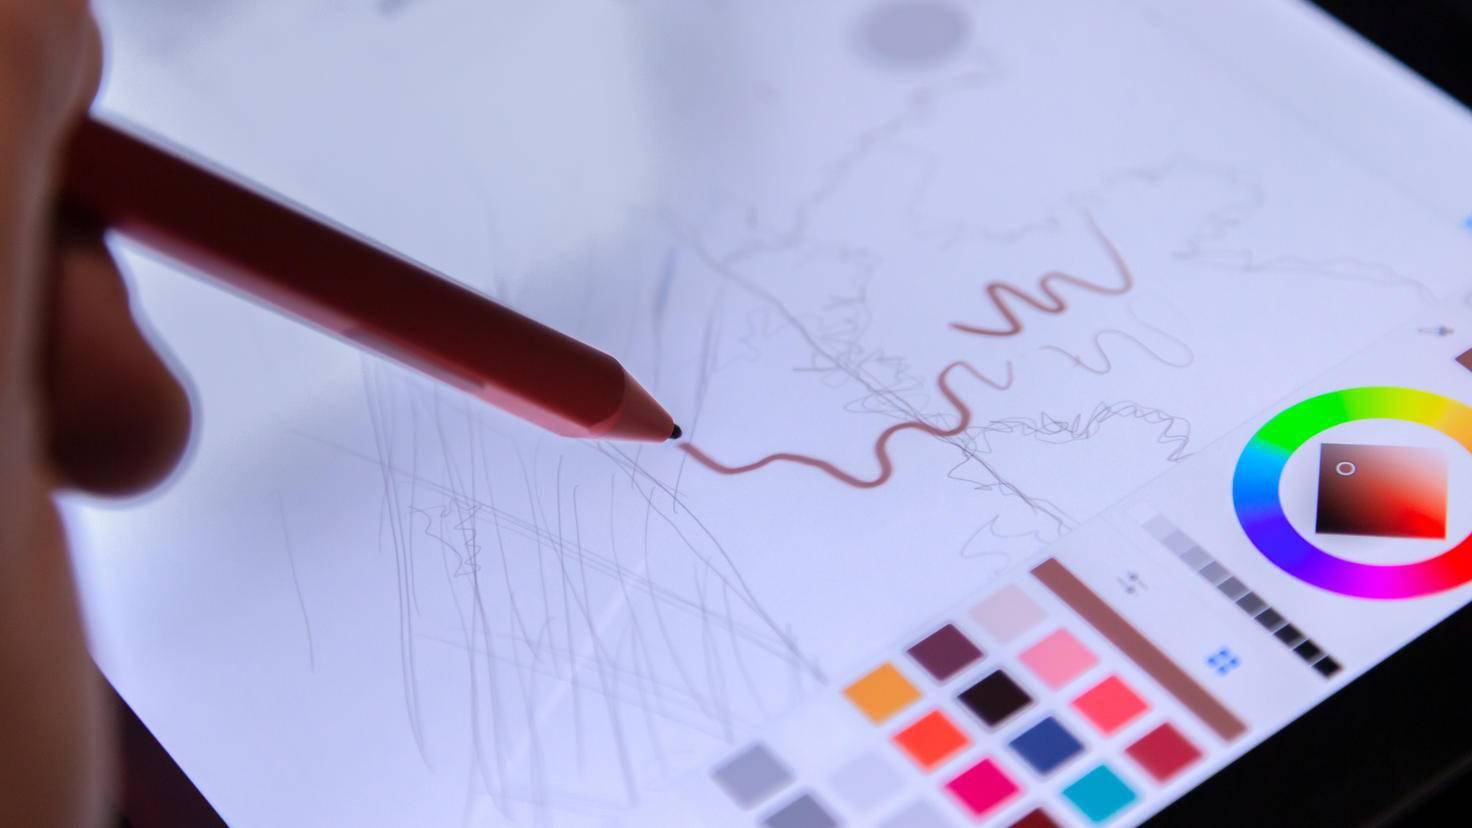 microsoft-surface-pro-7-pen